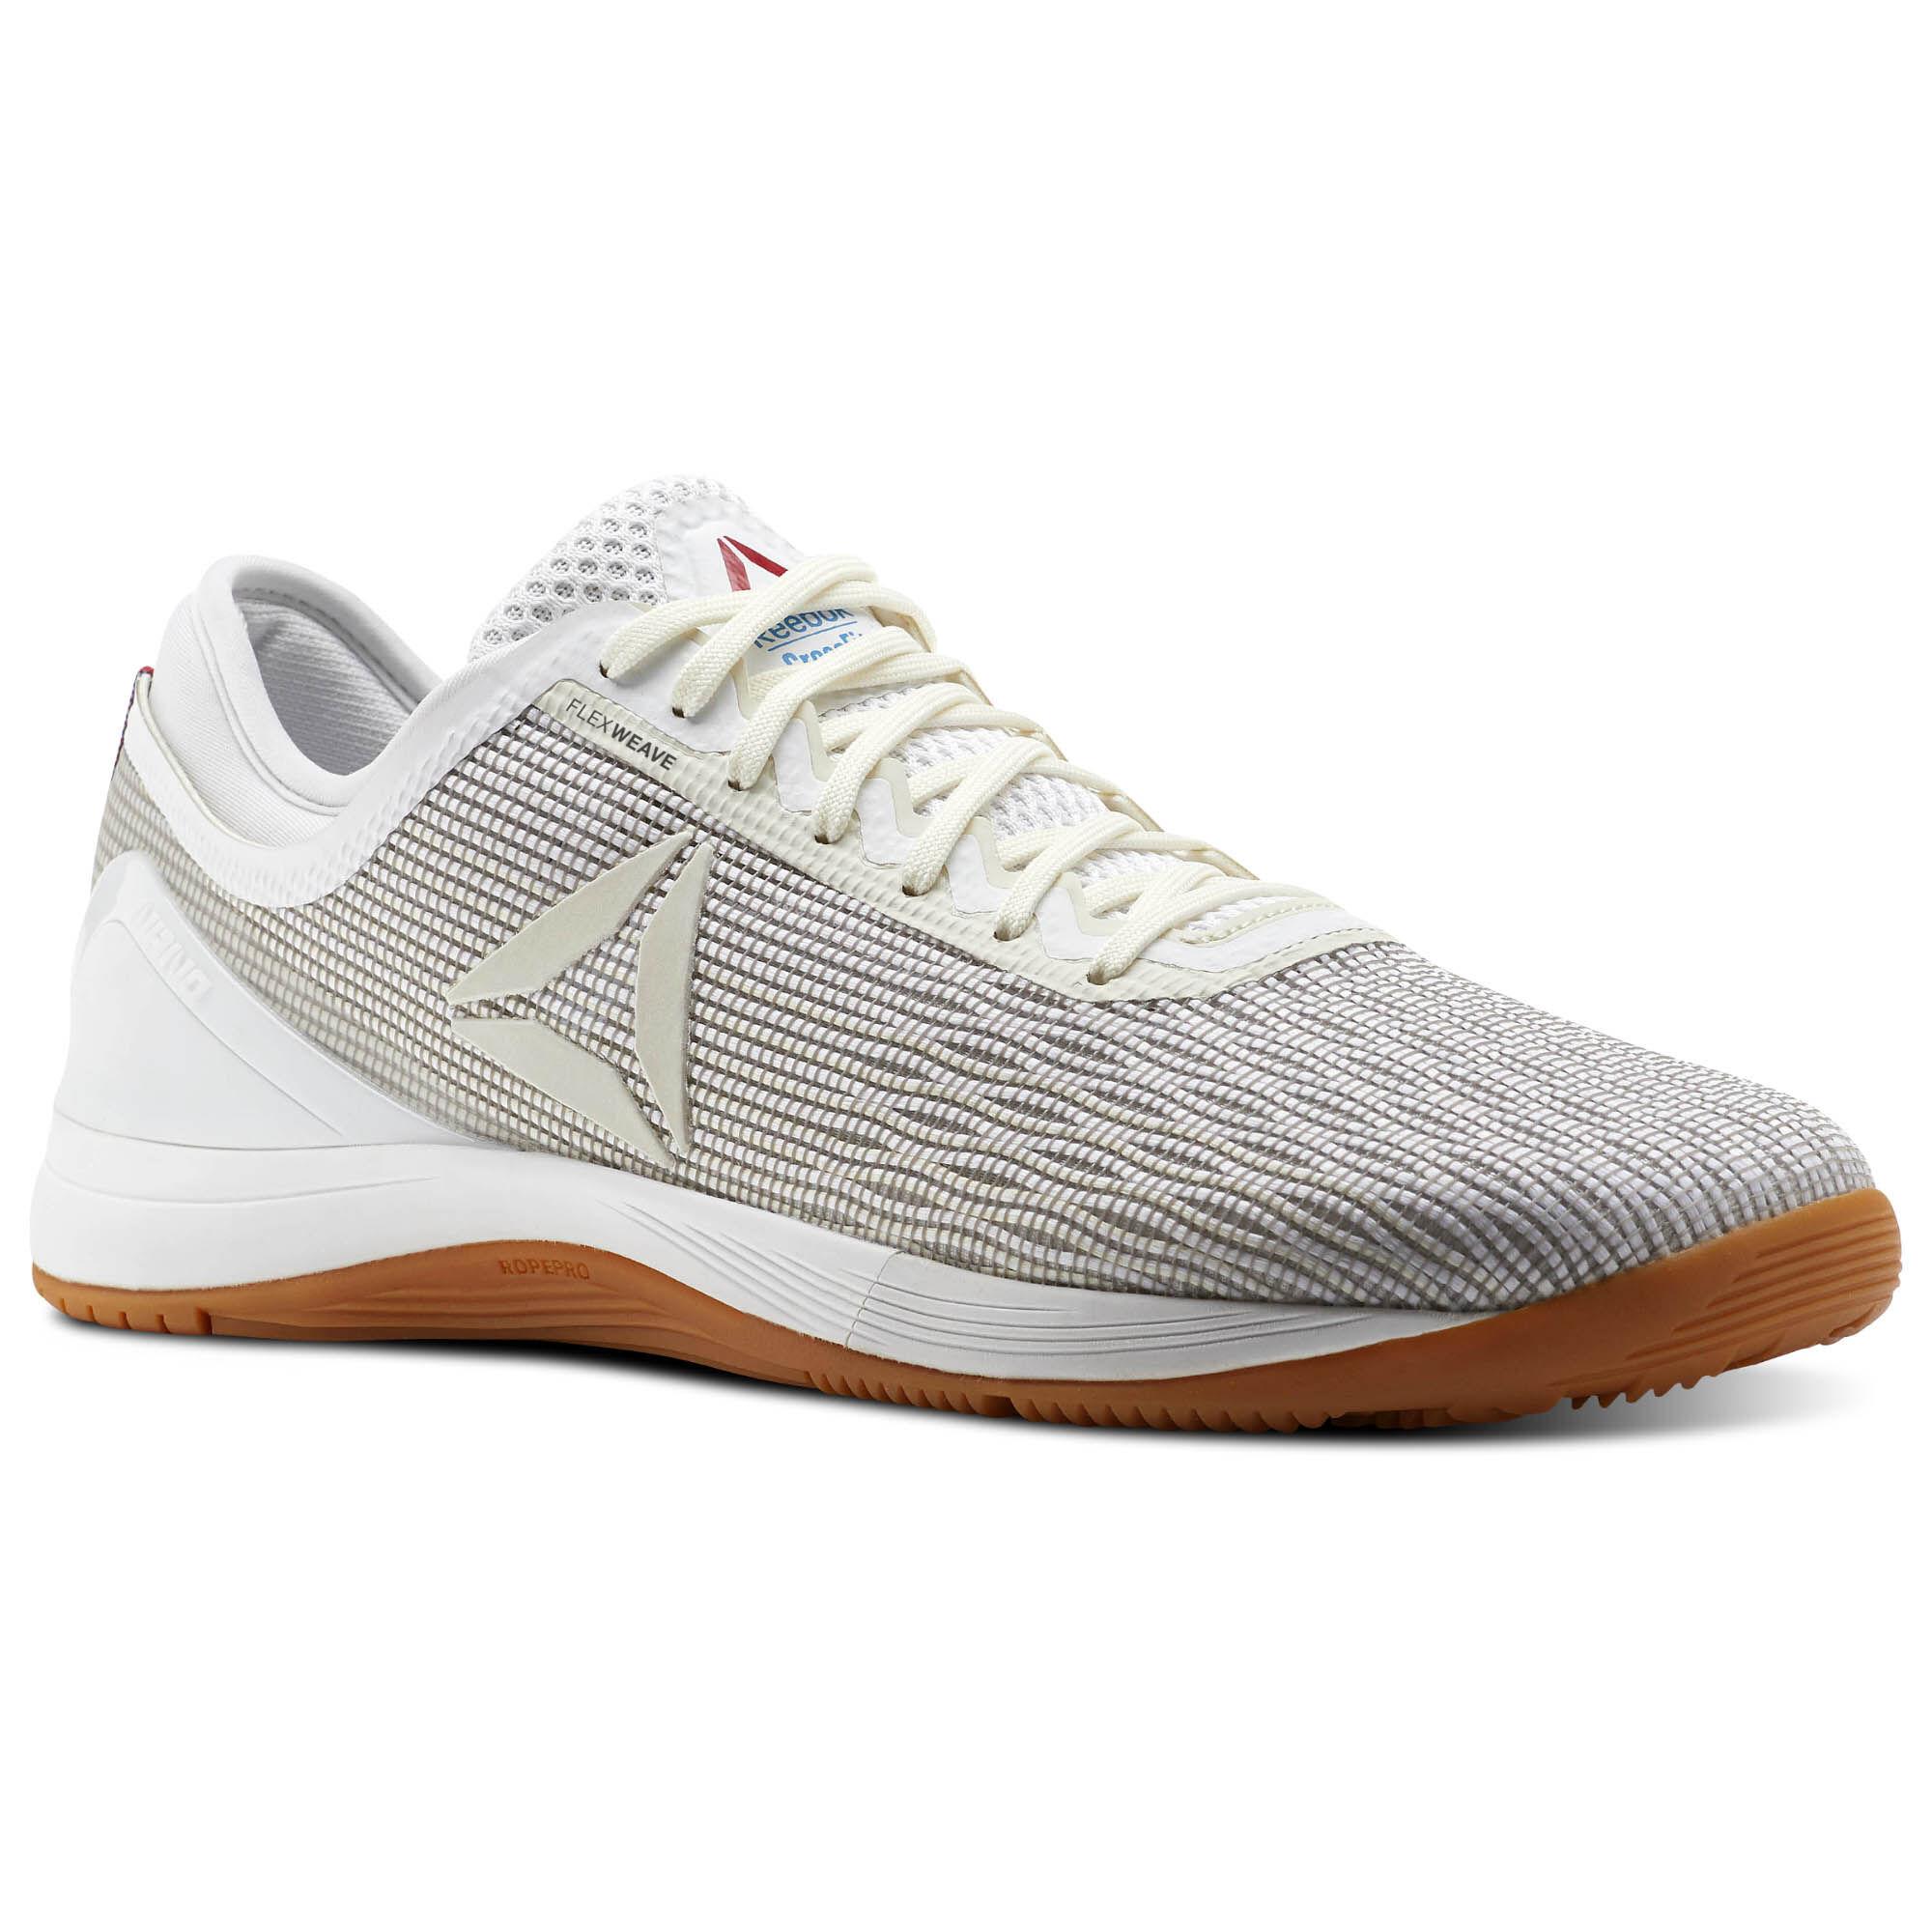 reebok shoes nano 8 reebok shoes